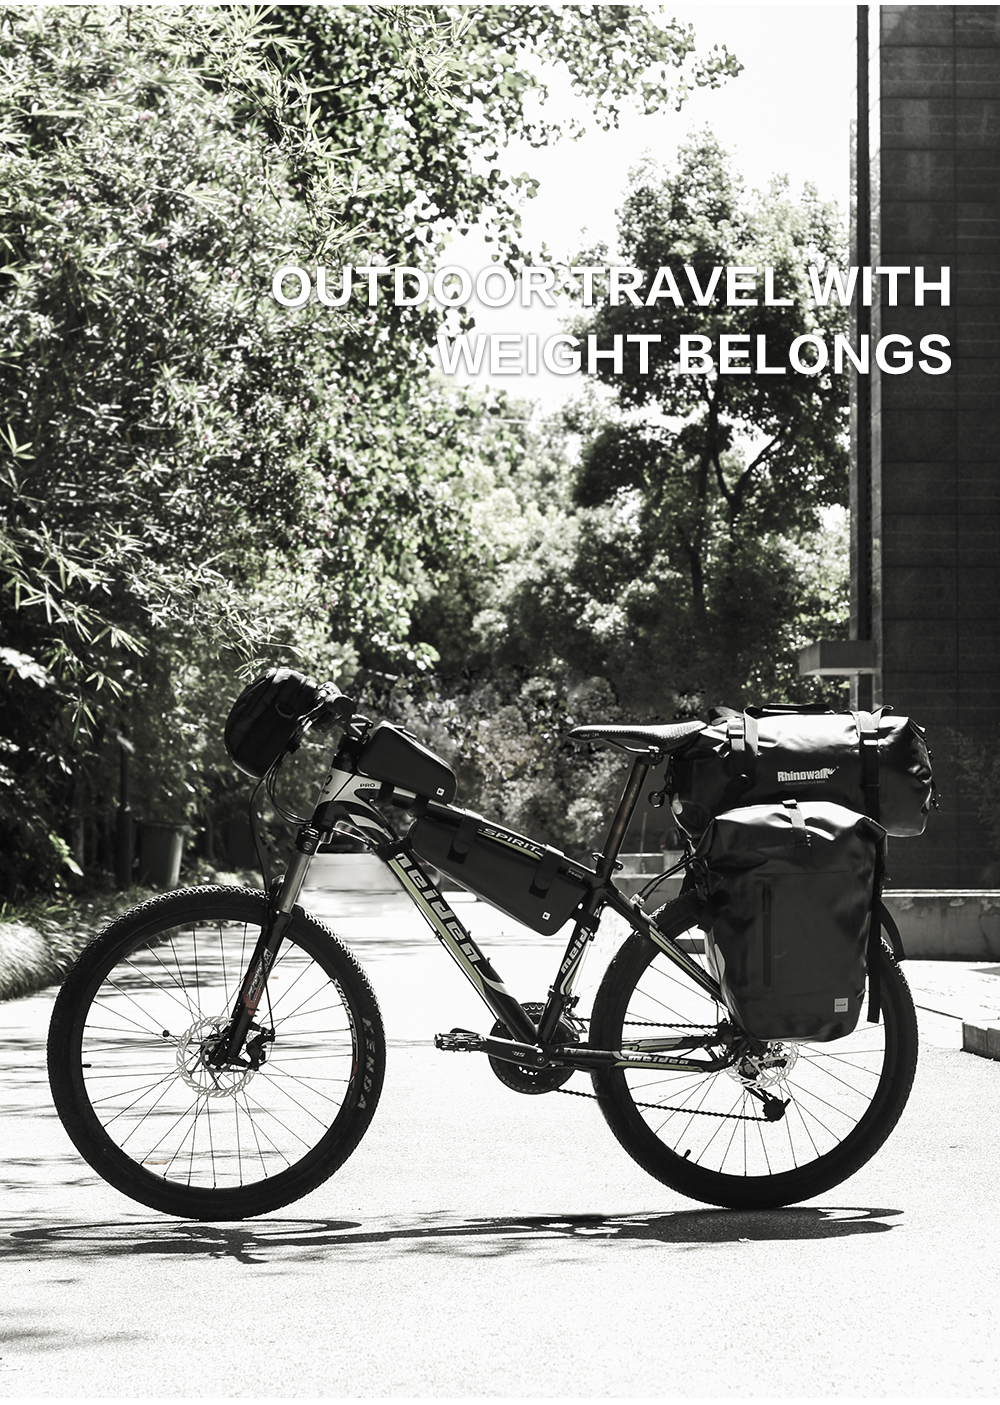 Rhinowalk Bicycle Luggage Bags 20L Full Waterproof for Road Bike Rear Rack Trunk Cycling Saddle Storage Pannier Multi Travel Bag (4)